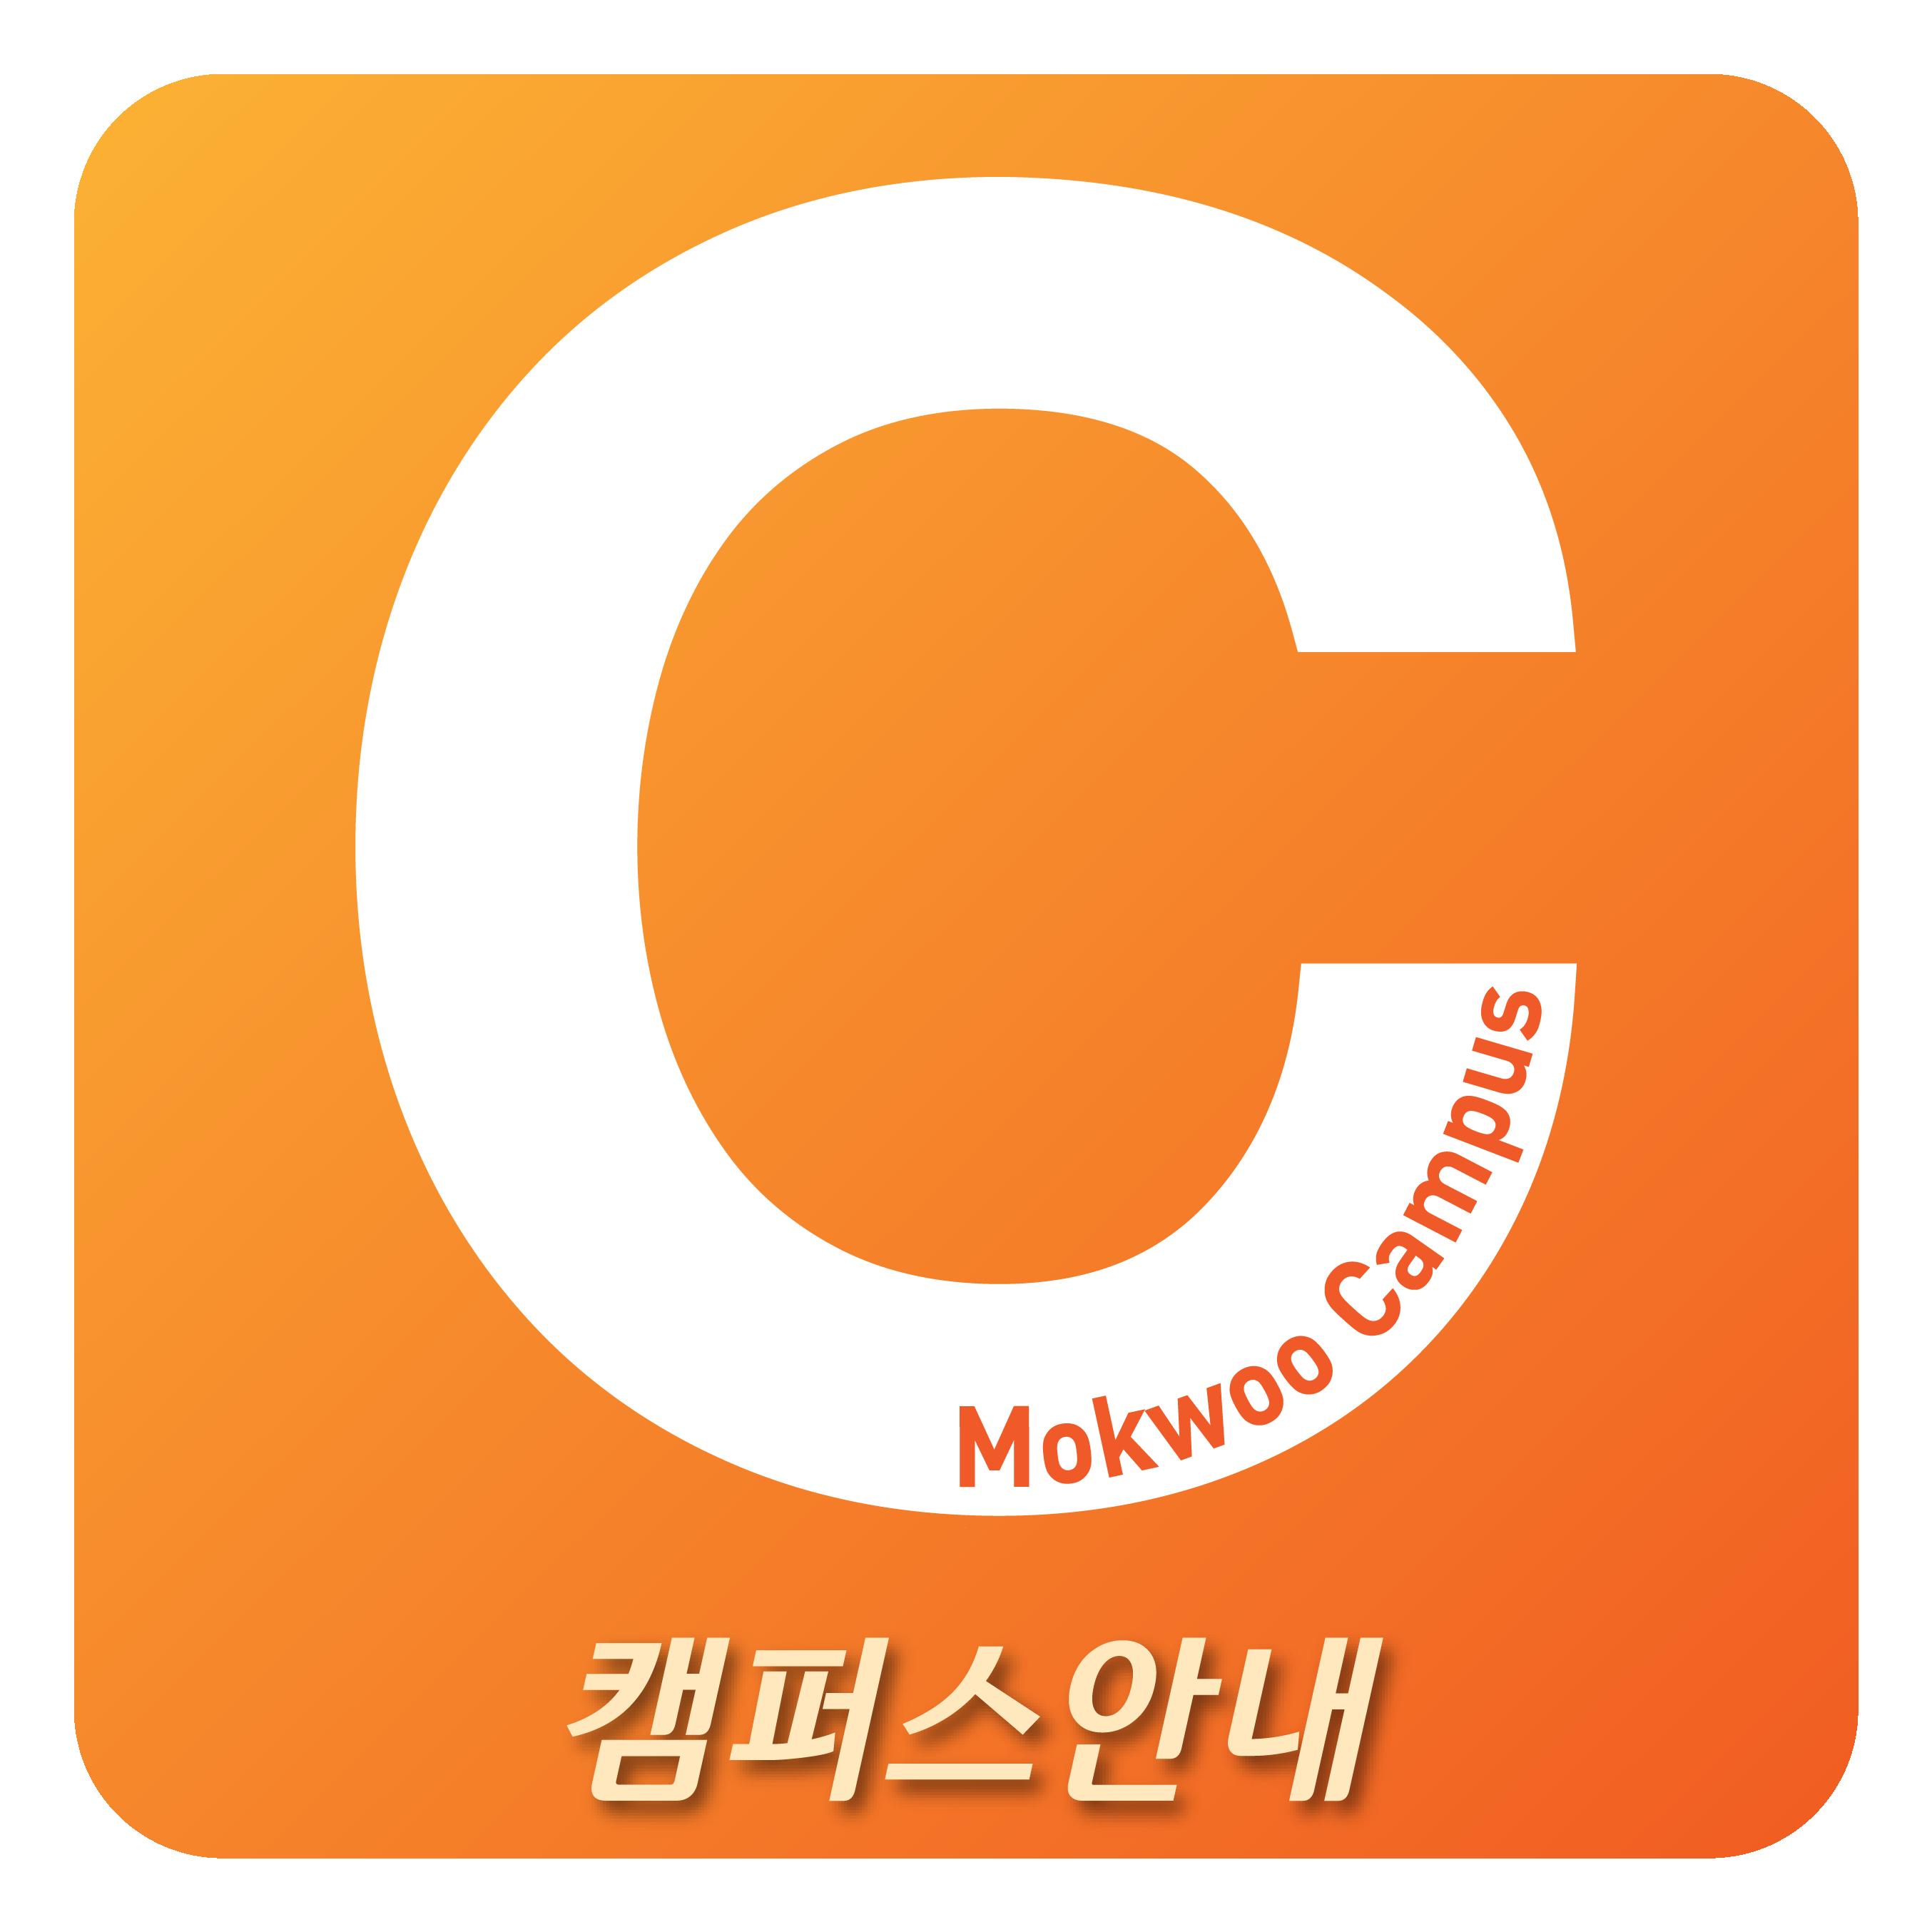 mwmain_icon_05-01